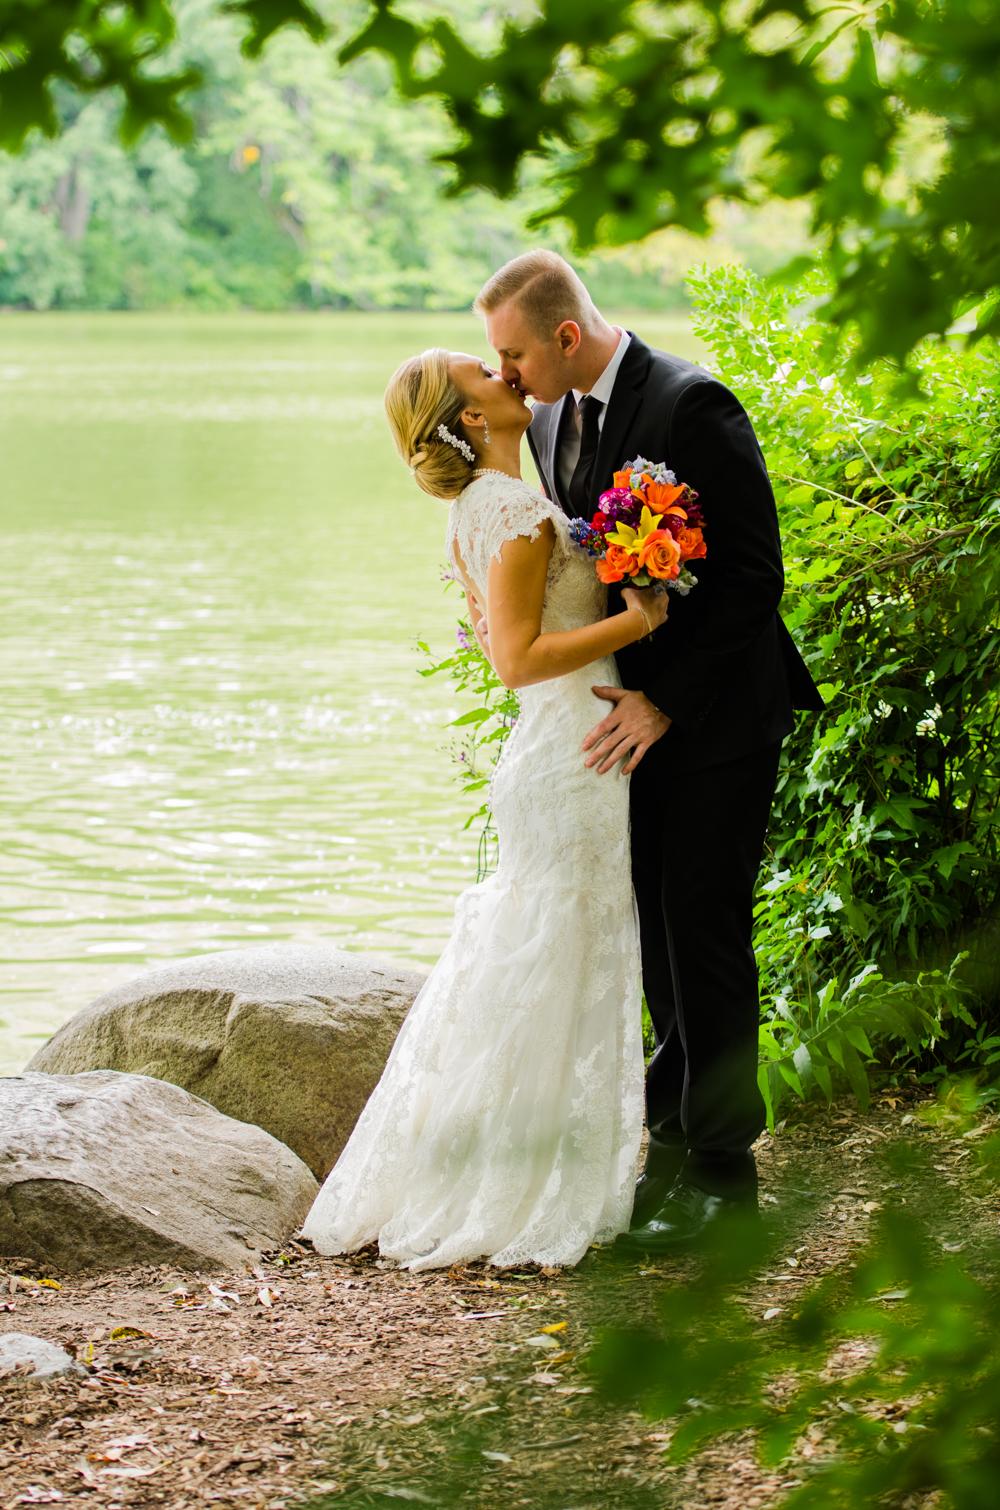 chris-nachtwey-nyc-new-york-city-central-park-wedding-photographers.jpg